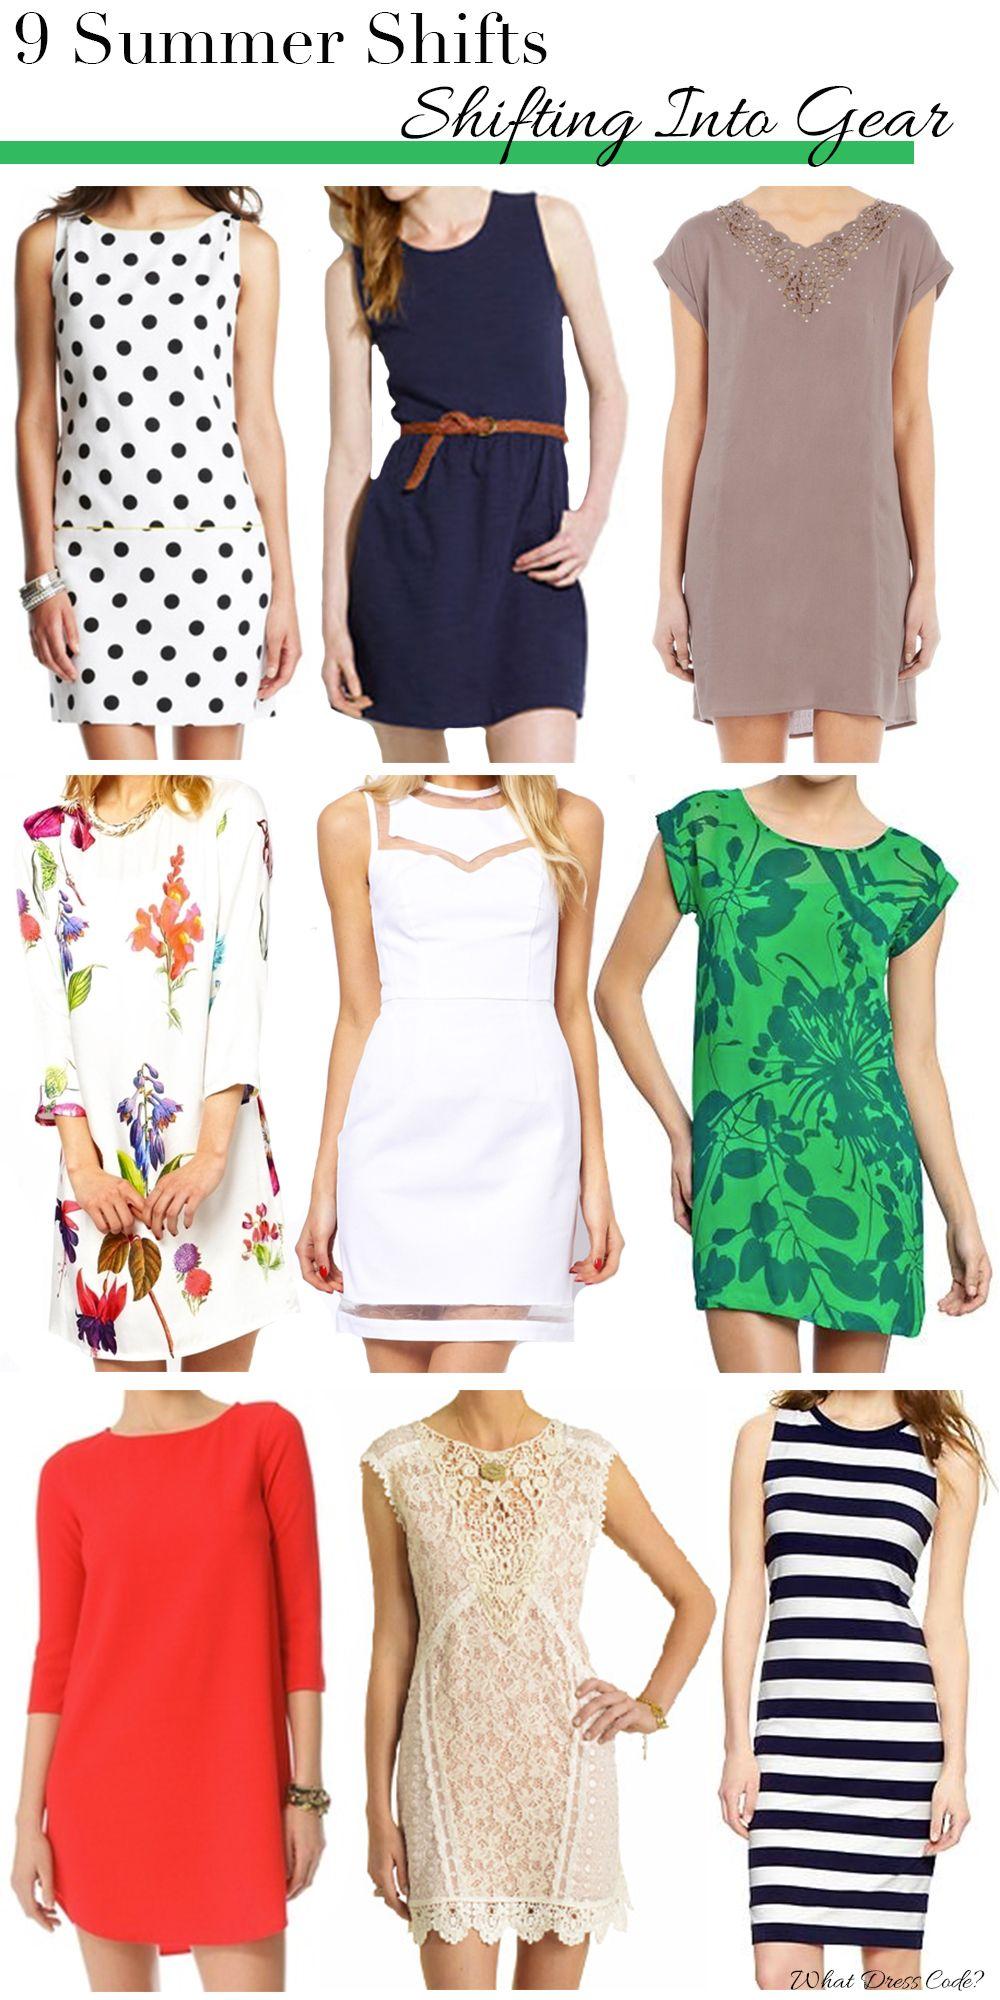 Best Summer Dresses 9 Super Comfortable Shift Dresses What Dress Code Shiftdress Summerdresses Summer Shift Dress Best Summer Dresses Shift Dress [ 2000 x 1000 Pixel ]